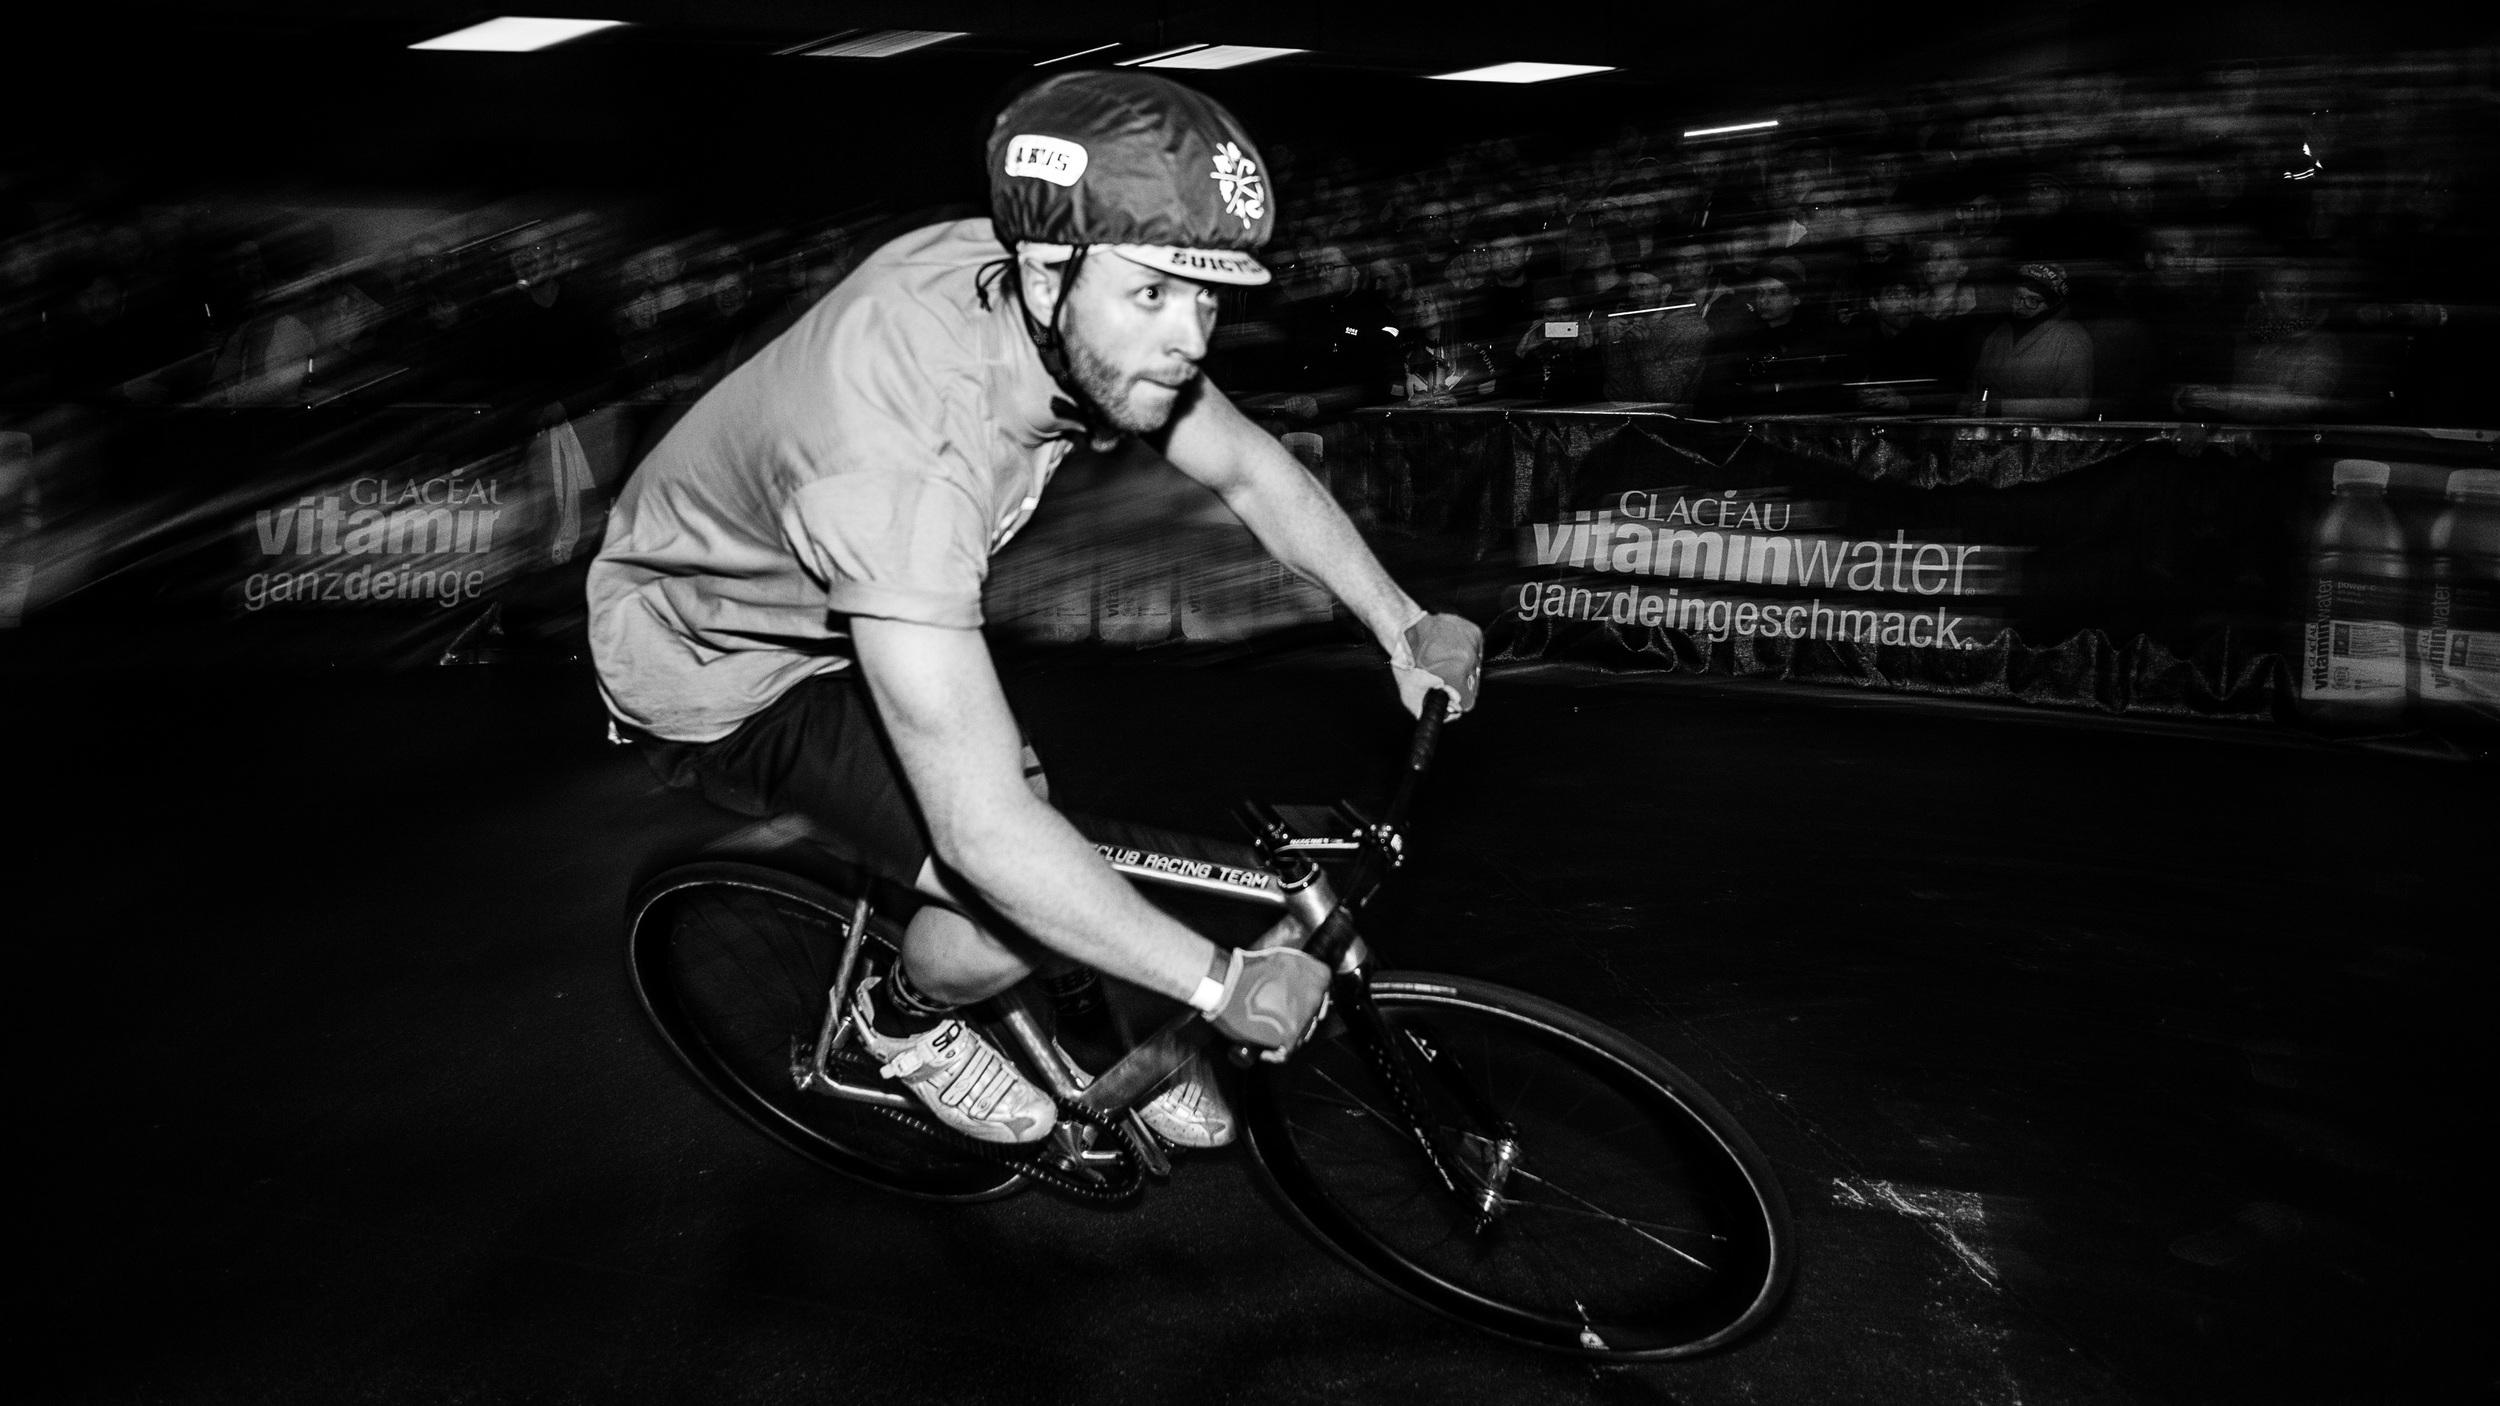 RAD RACE Last Man Standing, Berlin March 19 2016 - Shot by Drew Kaplan 30.jpg